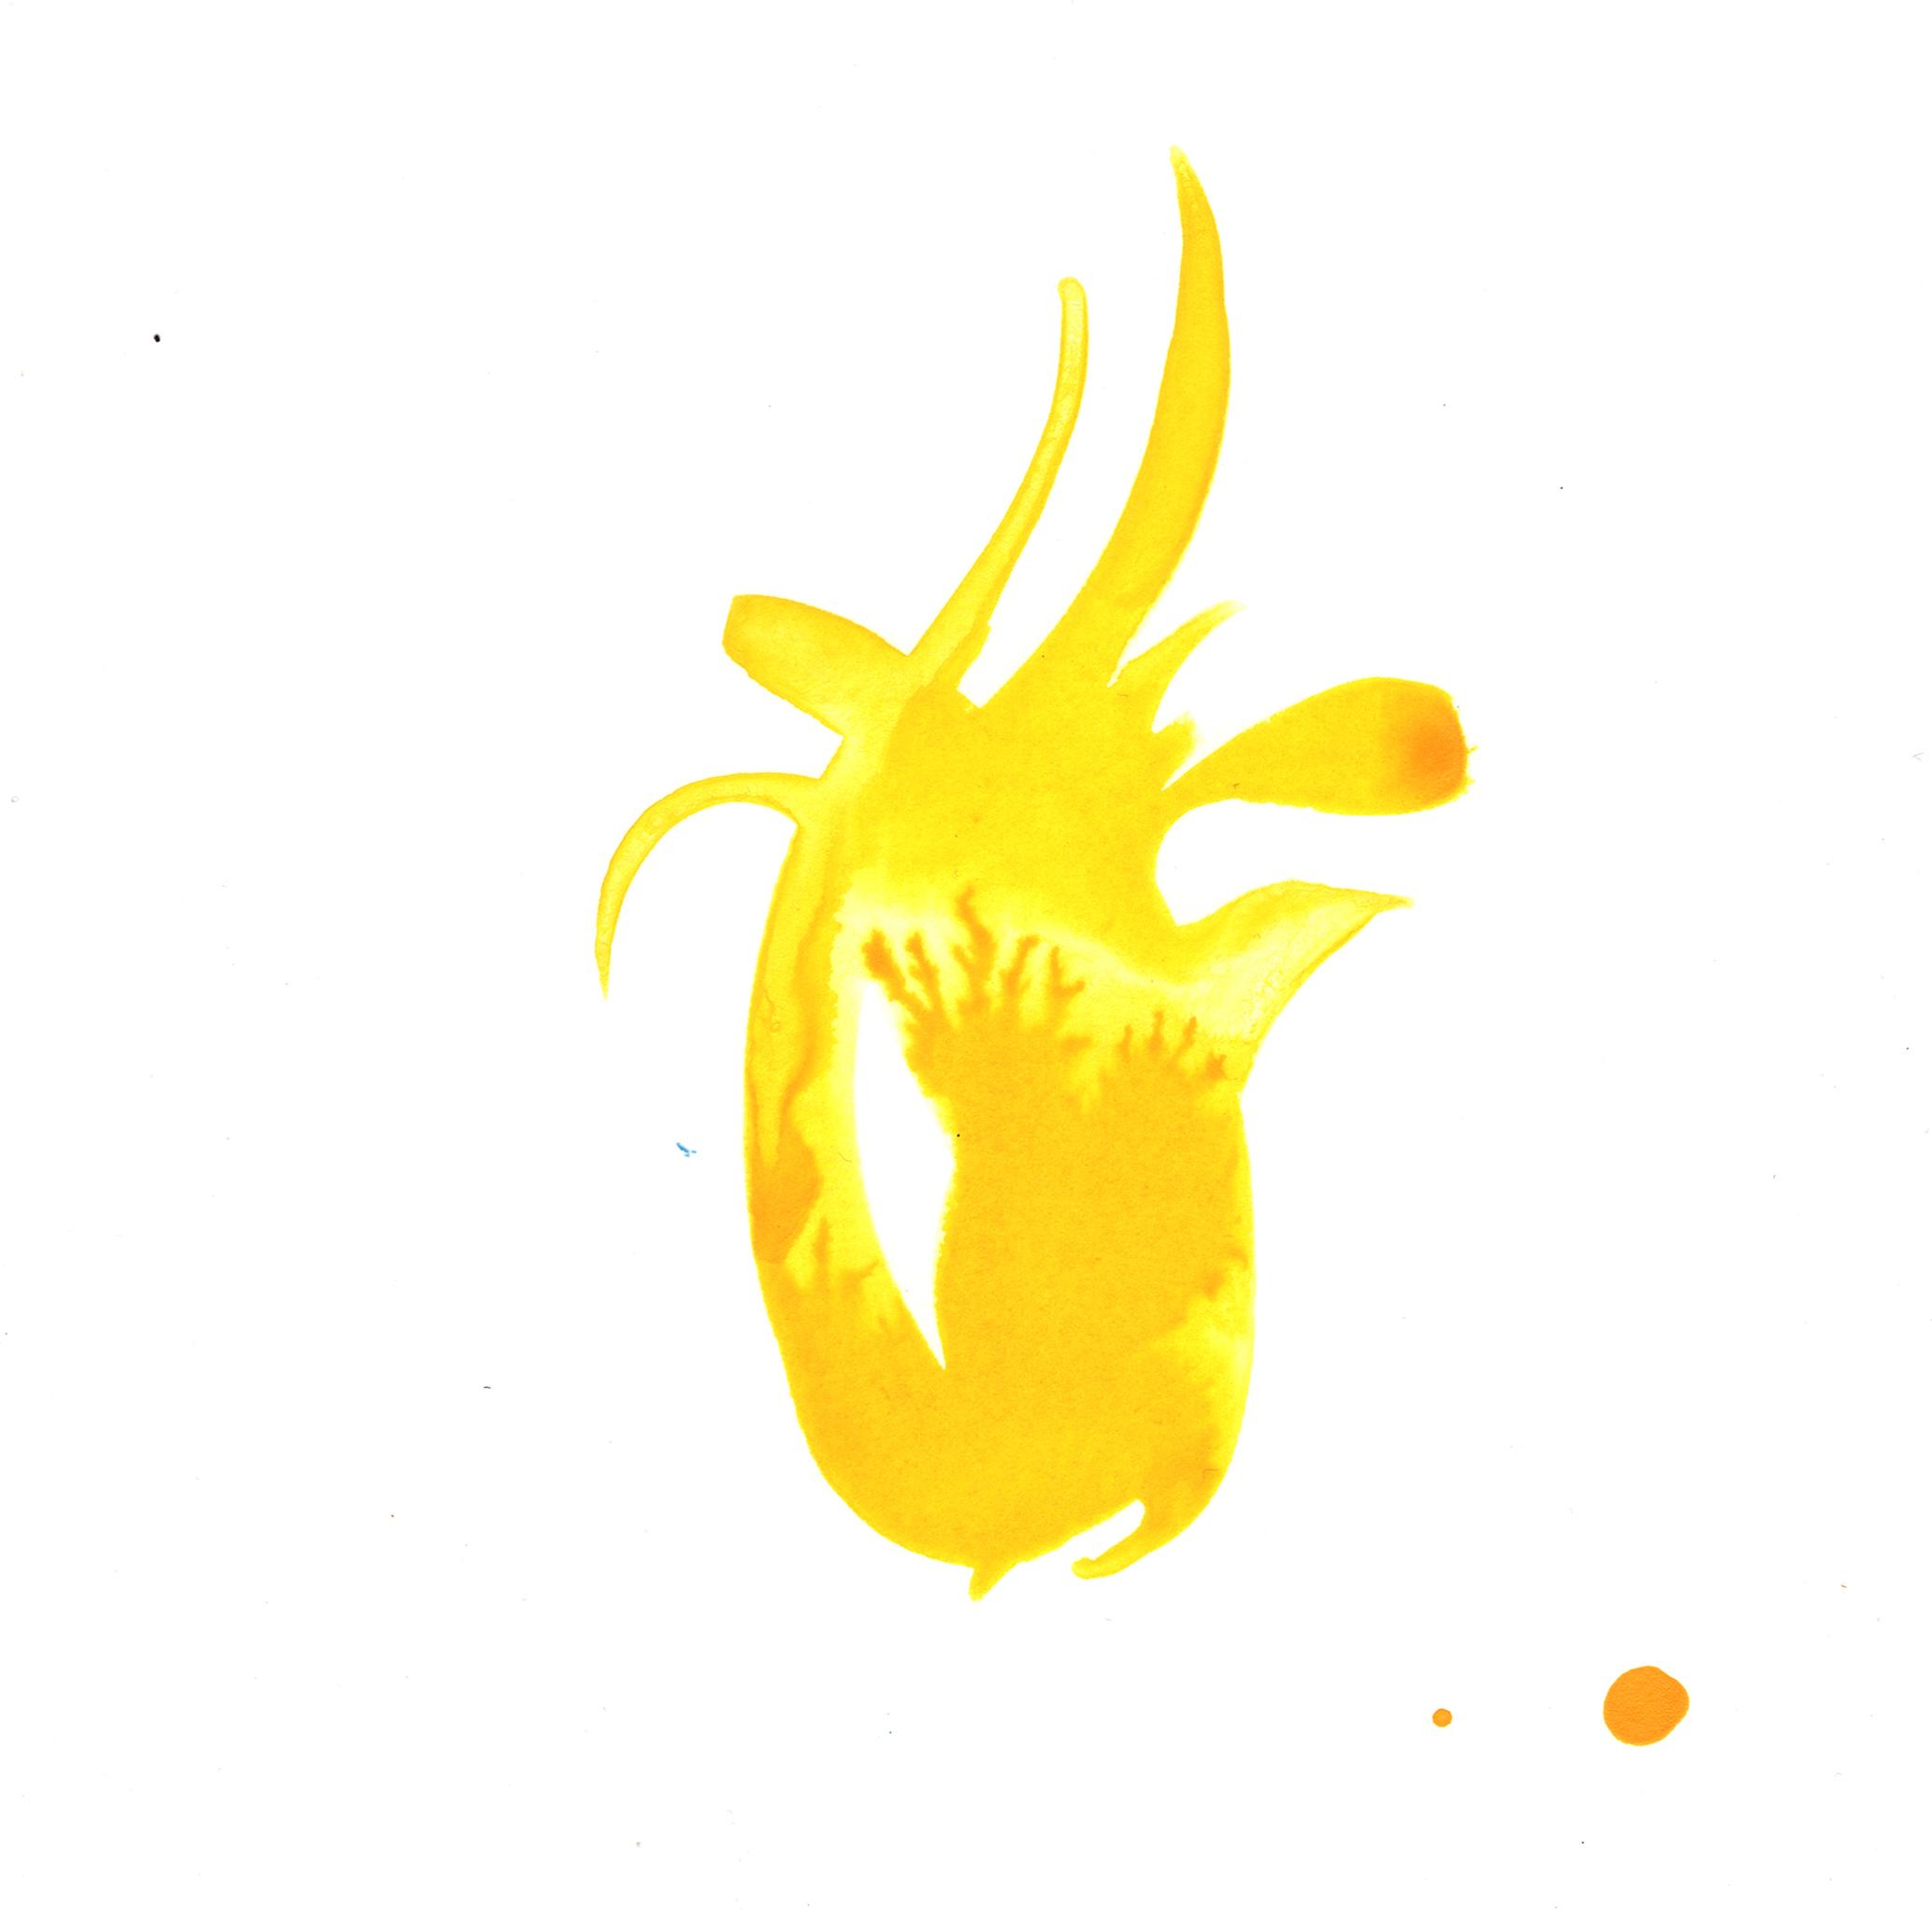 103.Lily.5.22.14.jpg